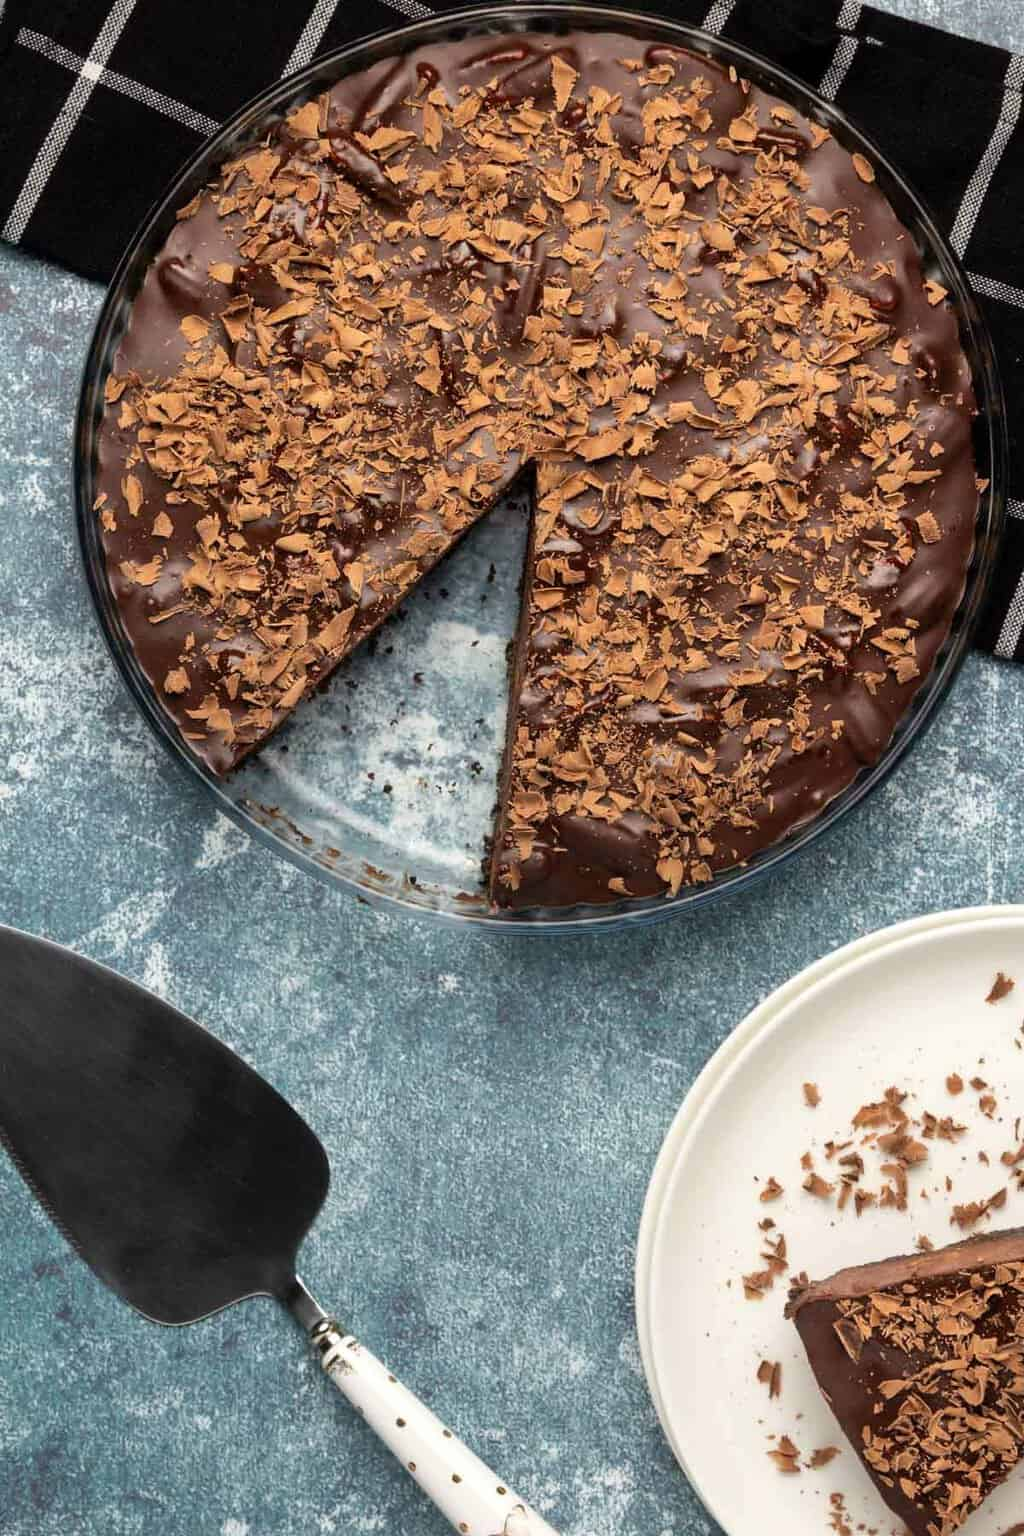 Vegan chocolate tart in a glass pie dish.